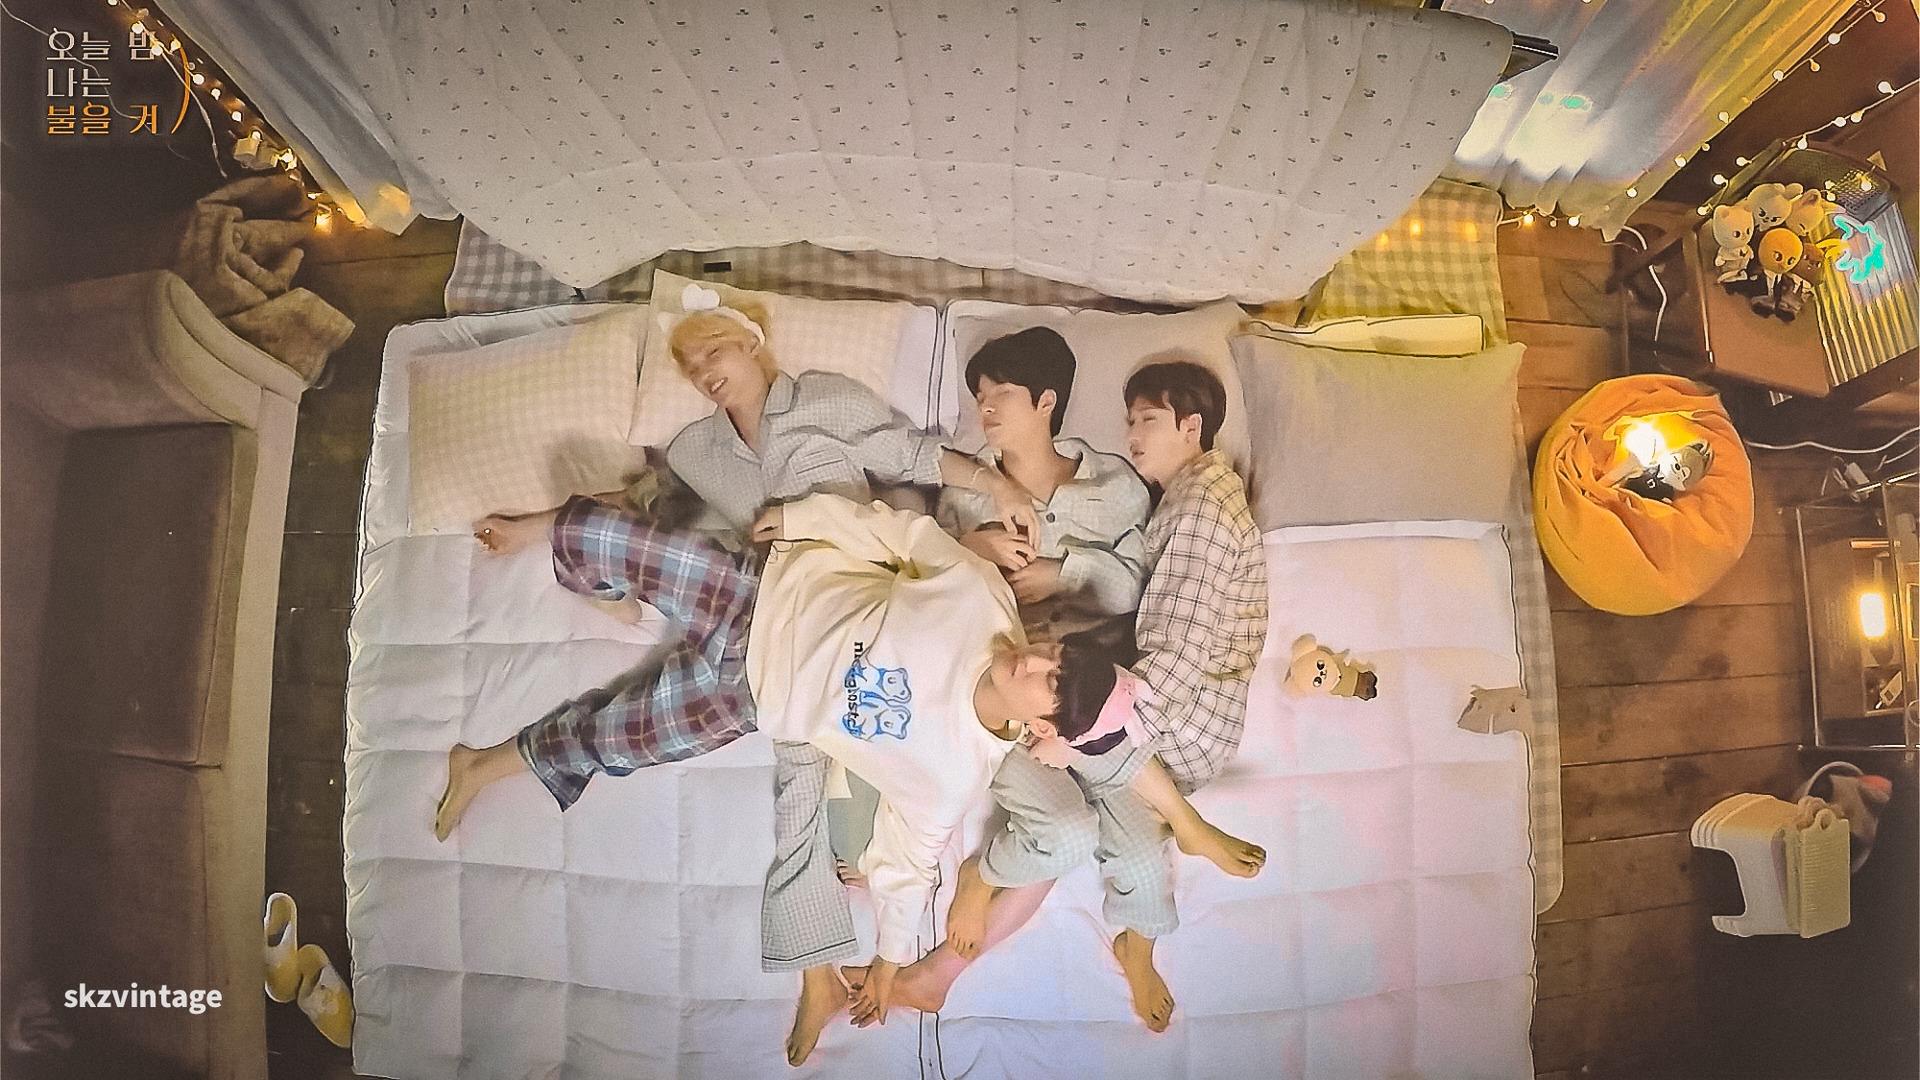 Stray Kids — s2021e99 — [All-Night] Ep.3 이불 없이 서로의 체온만이 전부였던 시간